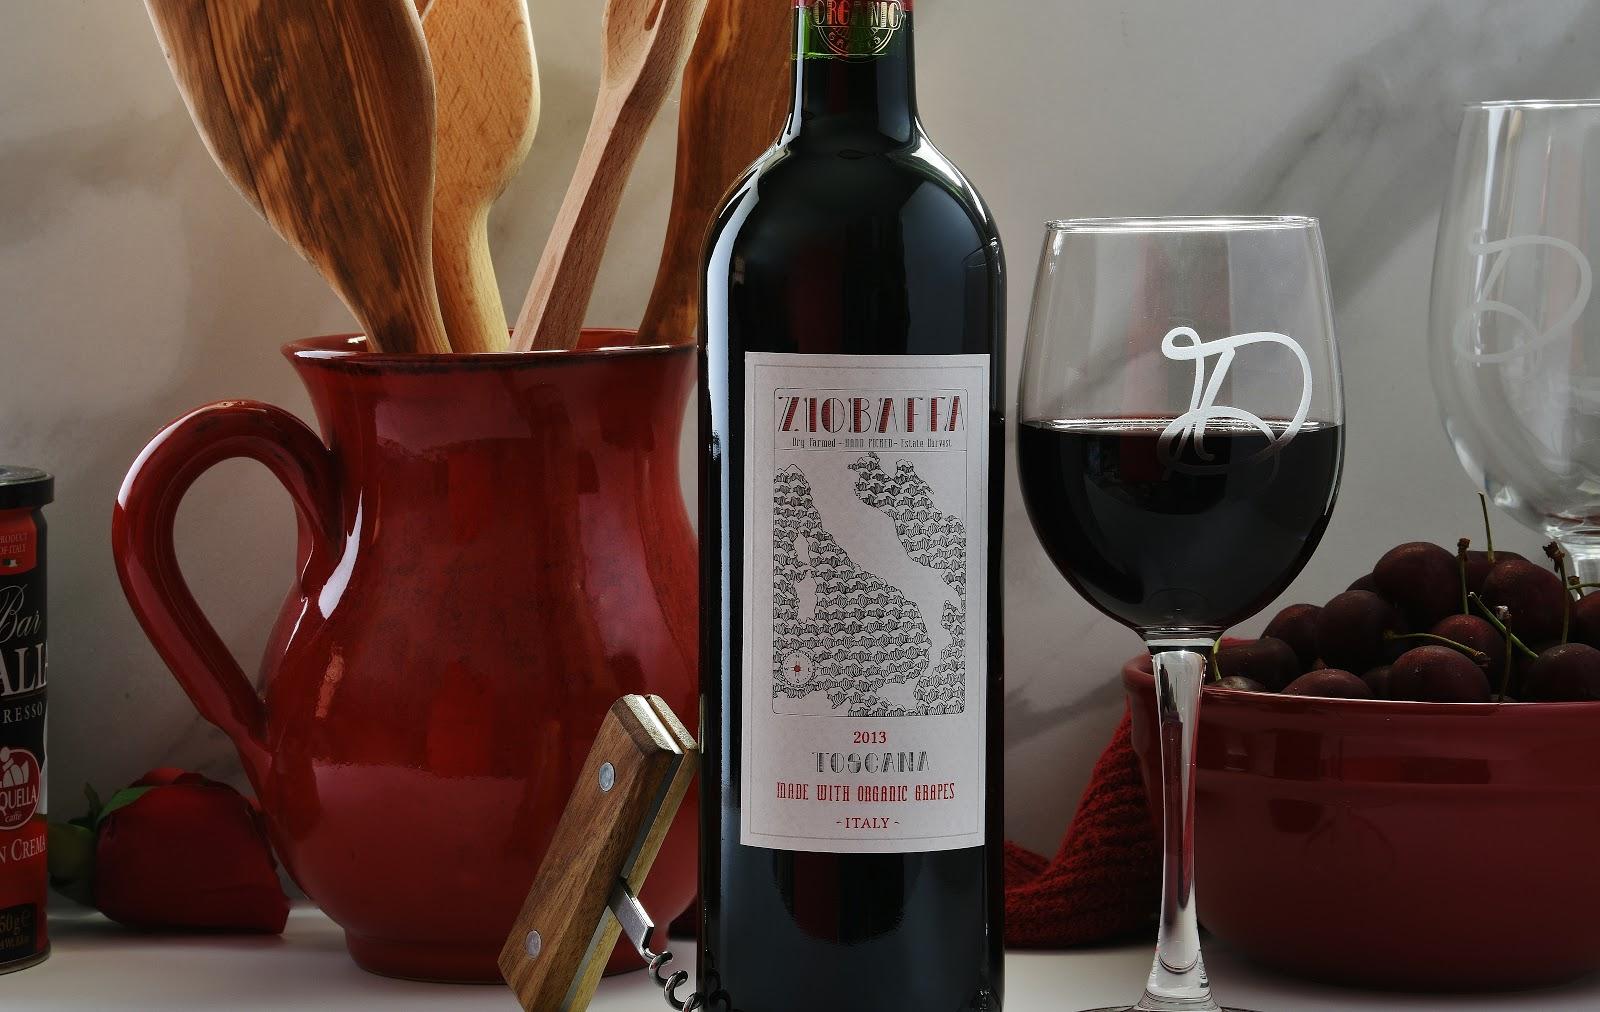 New Hampshire Wine Man Ziobaffa Toscana 2013 Red Wine Igt